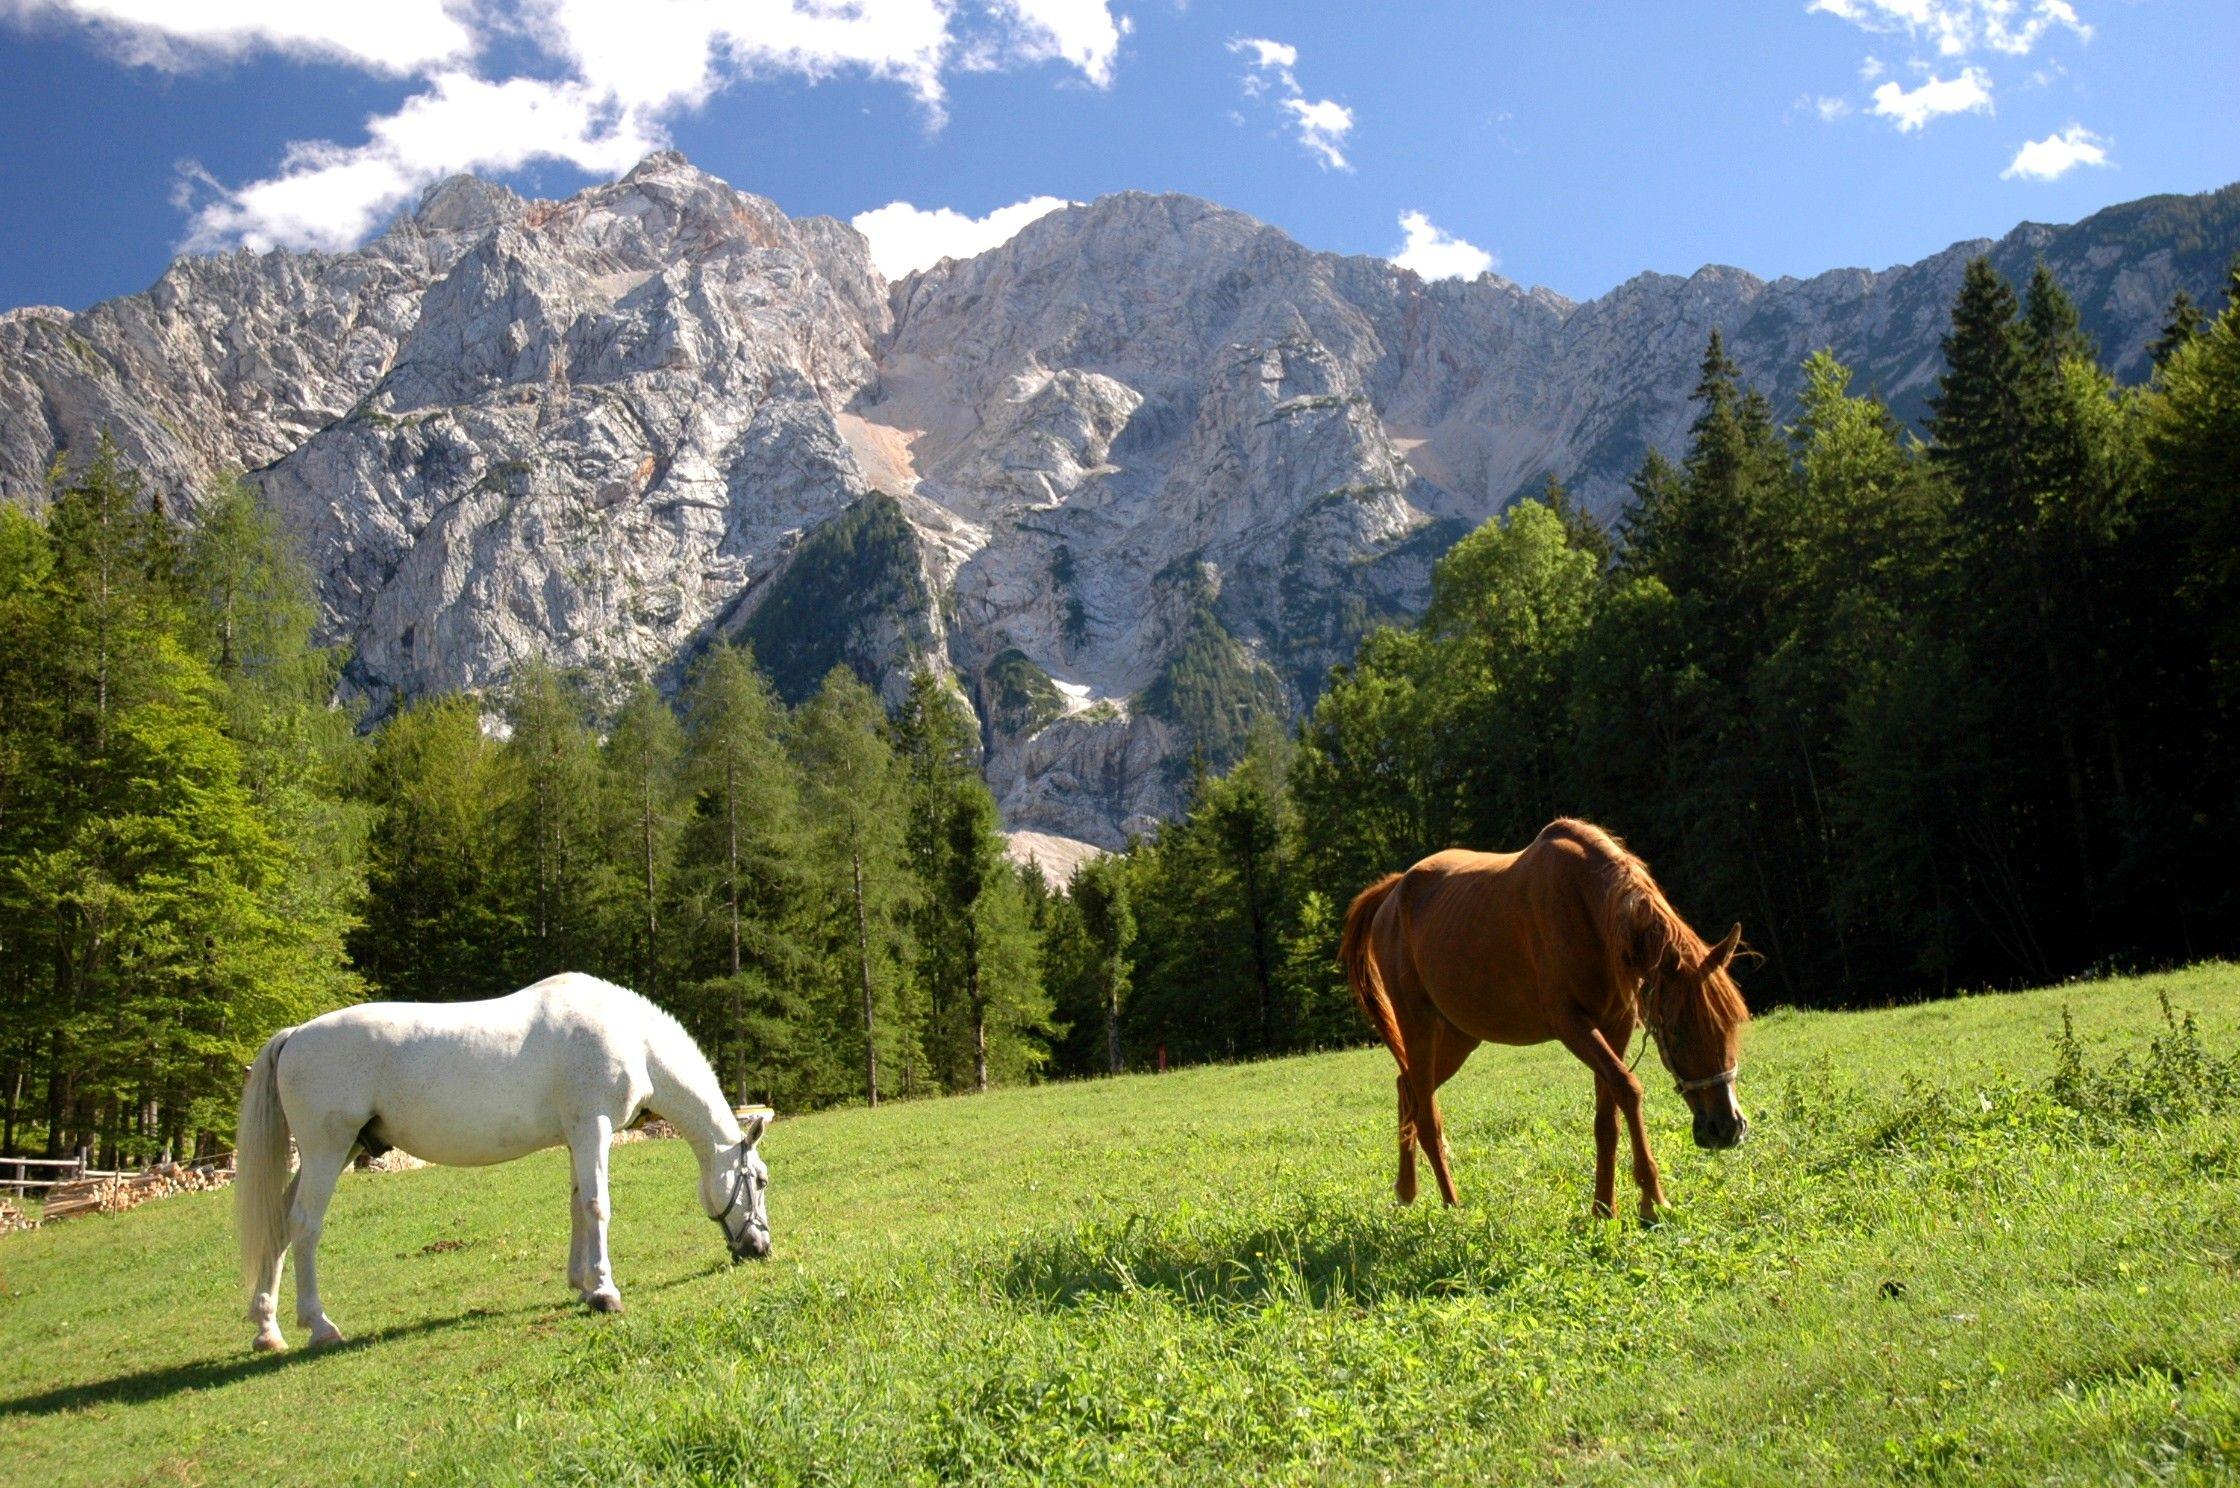 Horses and peaks, Jezersko, Slovenia   http://fieldnotesfromfatherhood.com/2012/09/29/jezersko-slovenia-fantastic-organic-slovenic-lovefest/